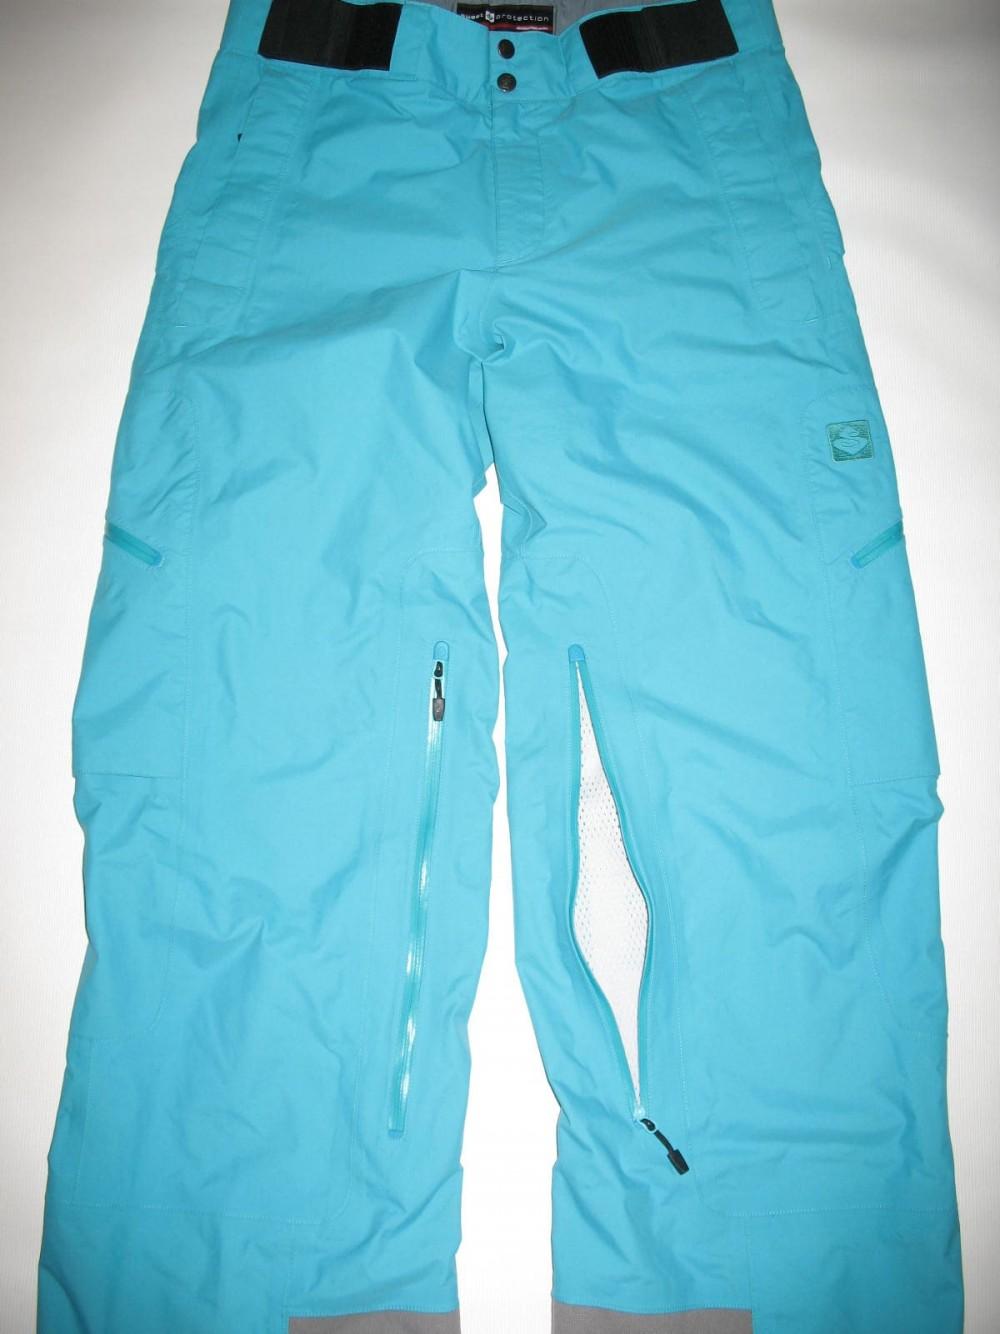 Штаны SWEET PROTECTION resolution GTX pants (размер L) - 9